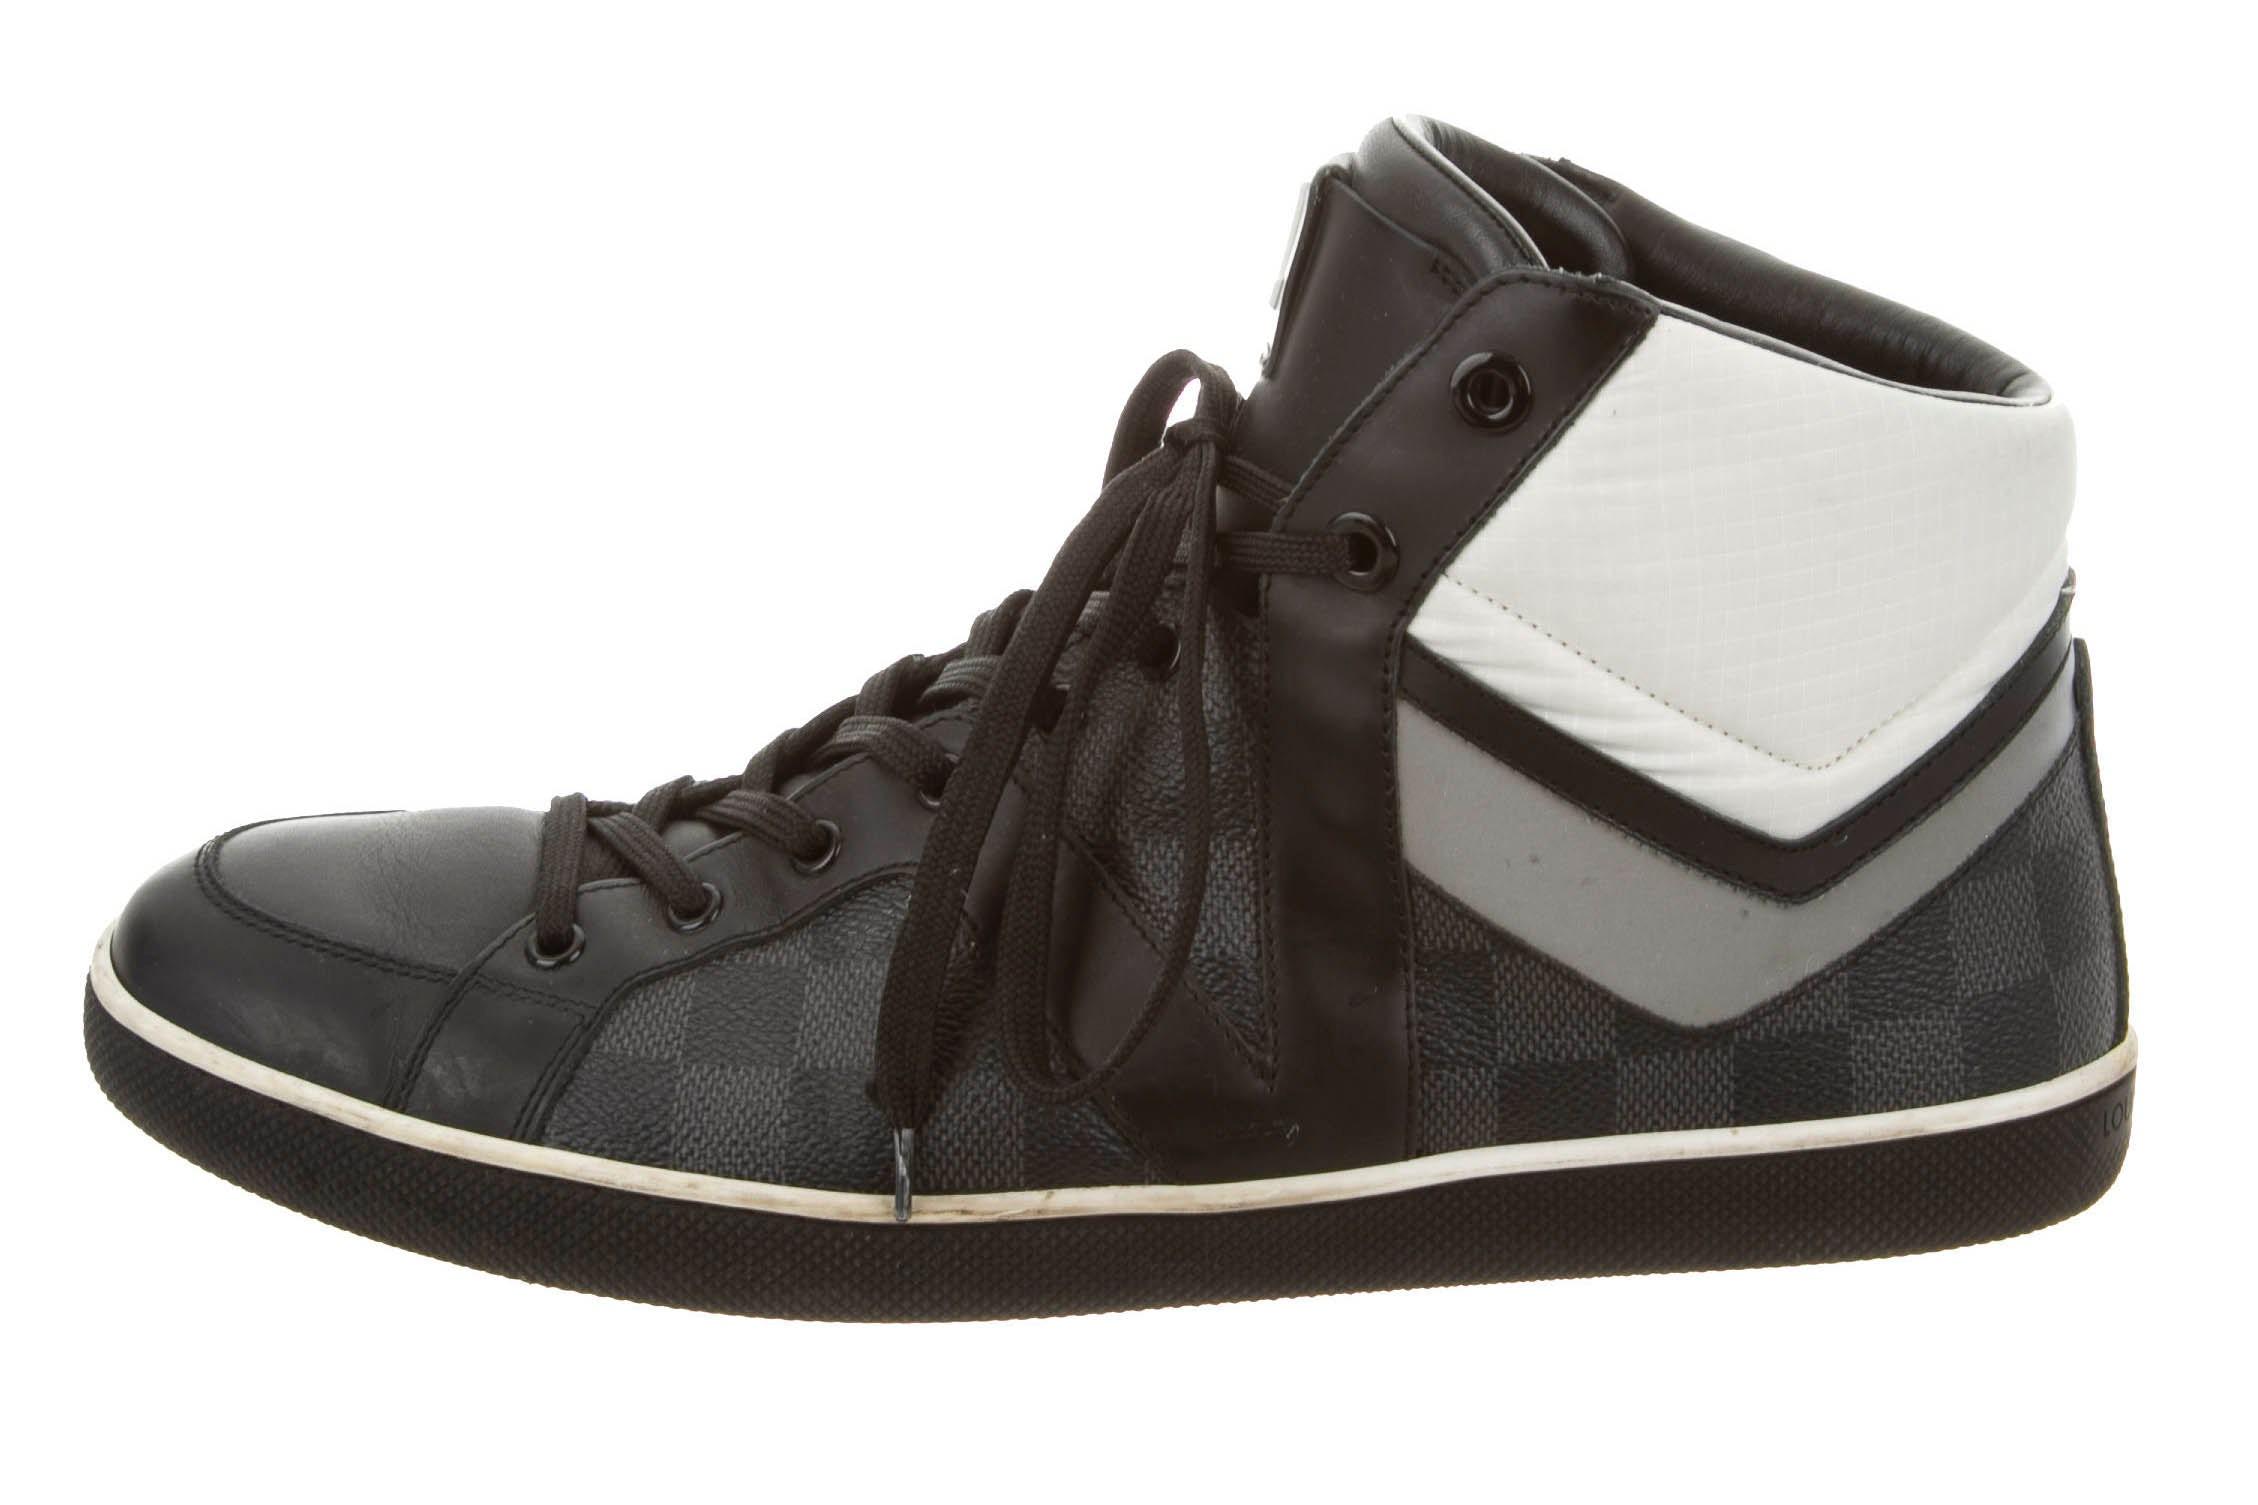 The Louis Vuitton Damier high-top sneaker | Source: The RealReal